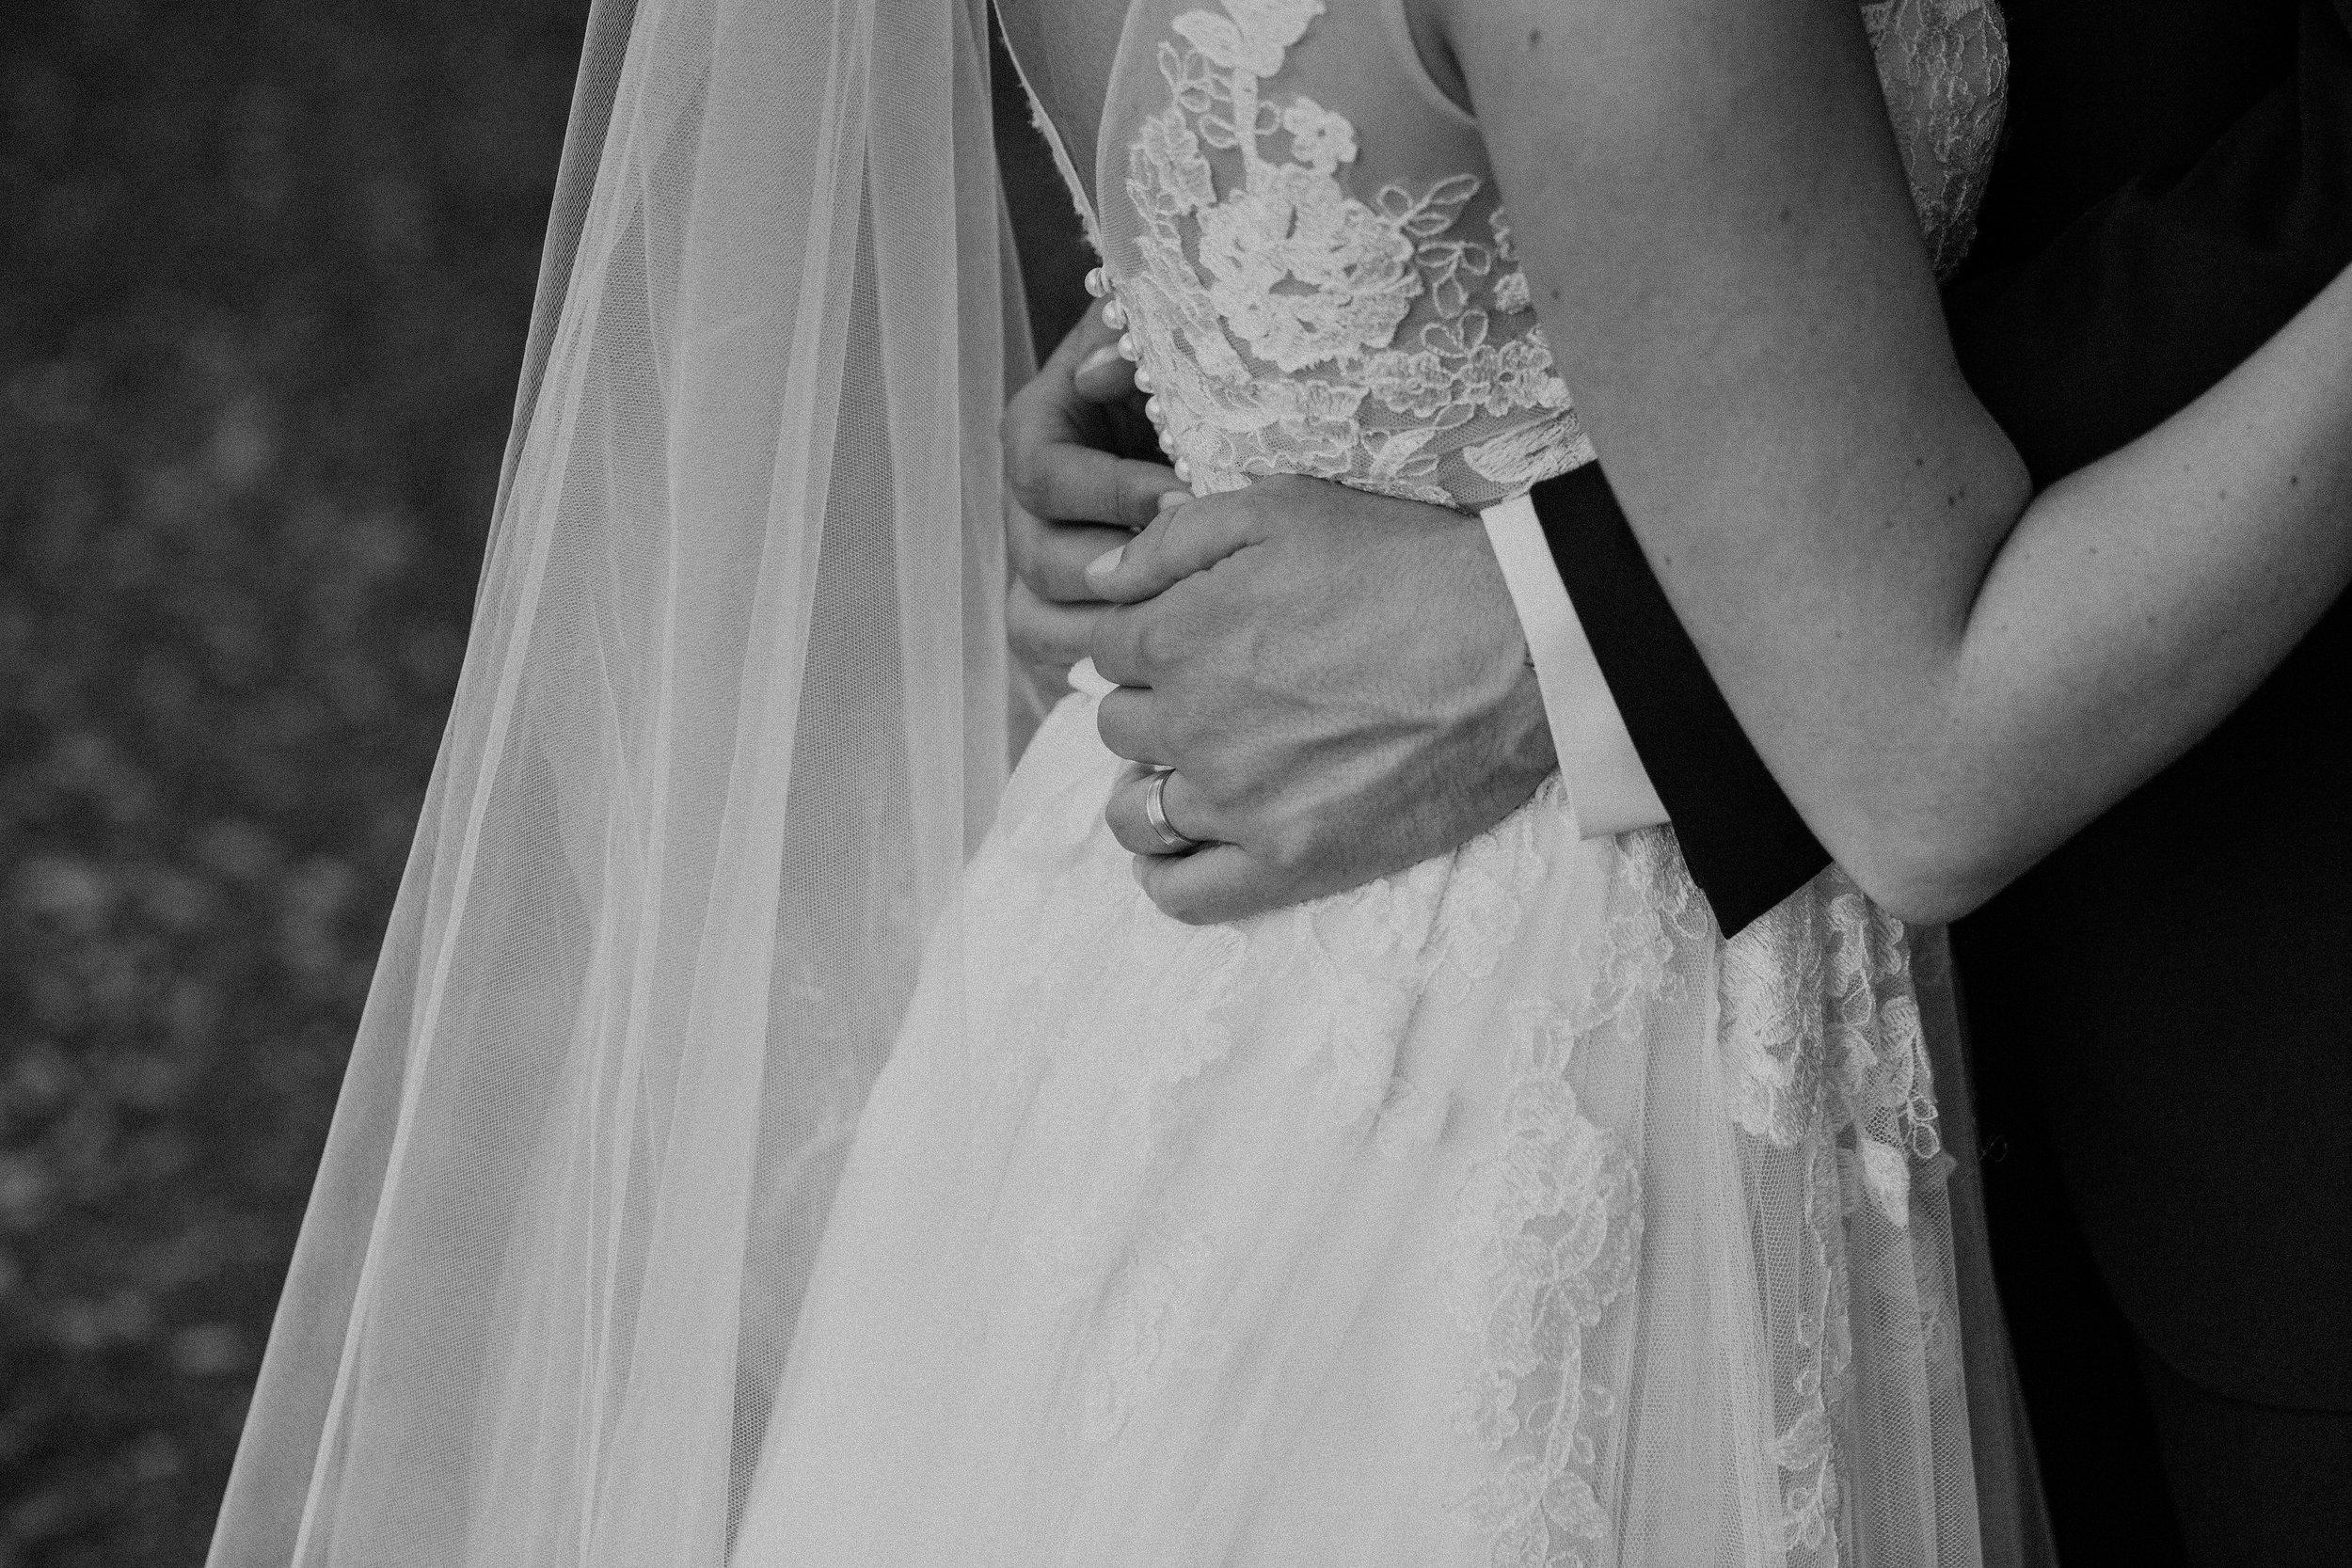 Southern Fete, Southern Wedding, Wedding dress details, Bride and Groom, Carolynn Seibert Photography